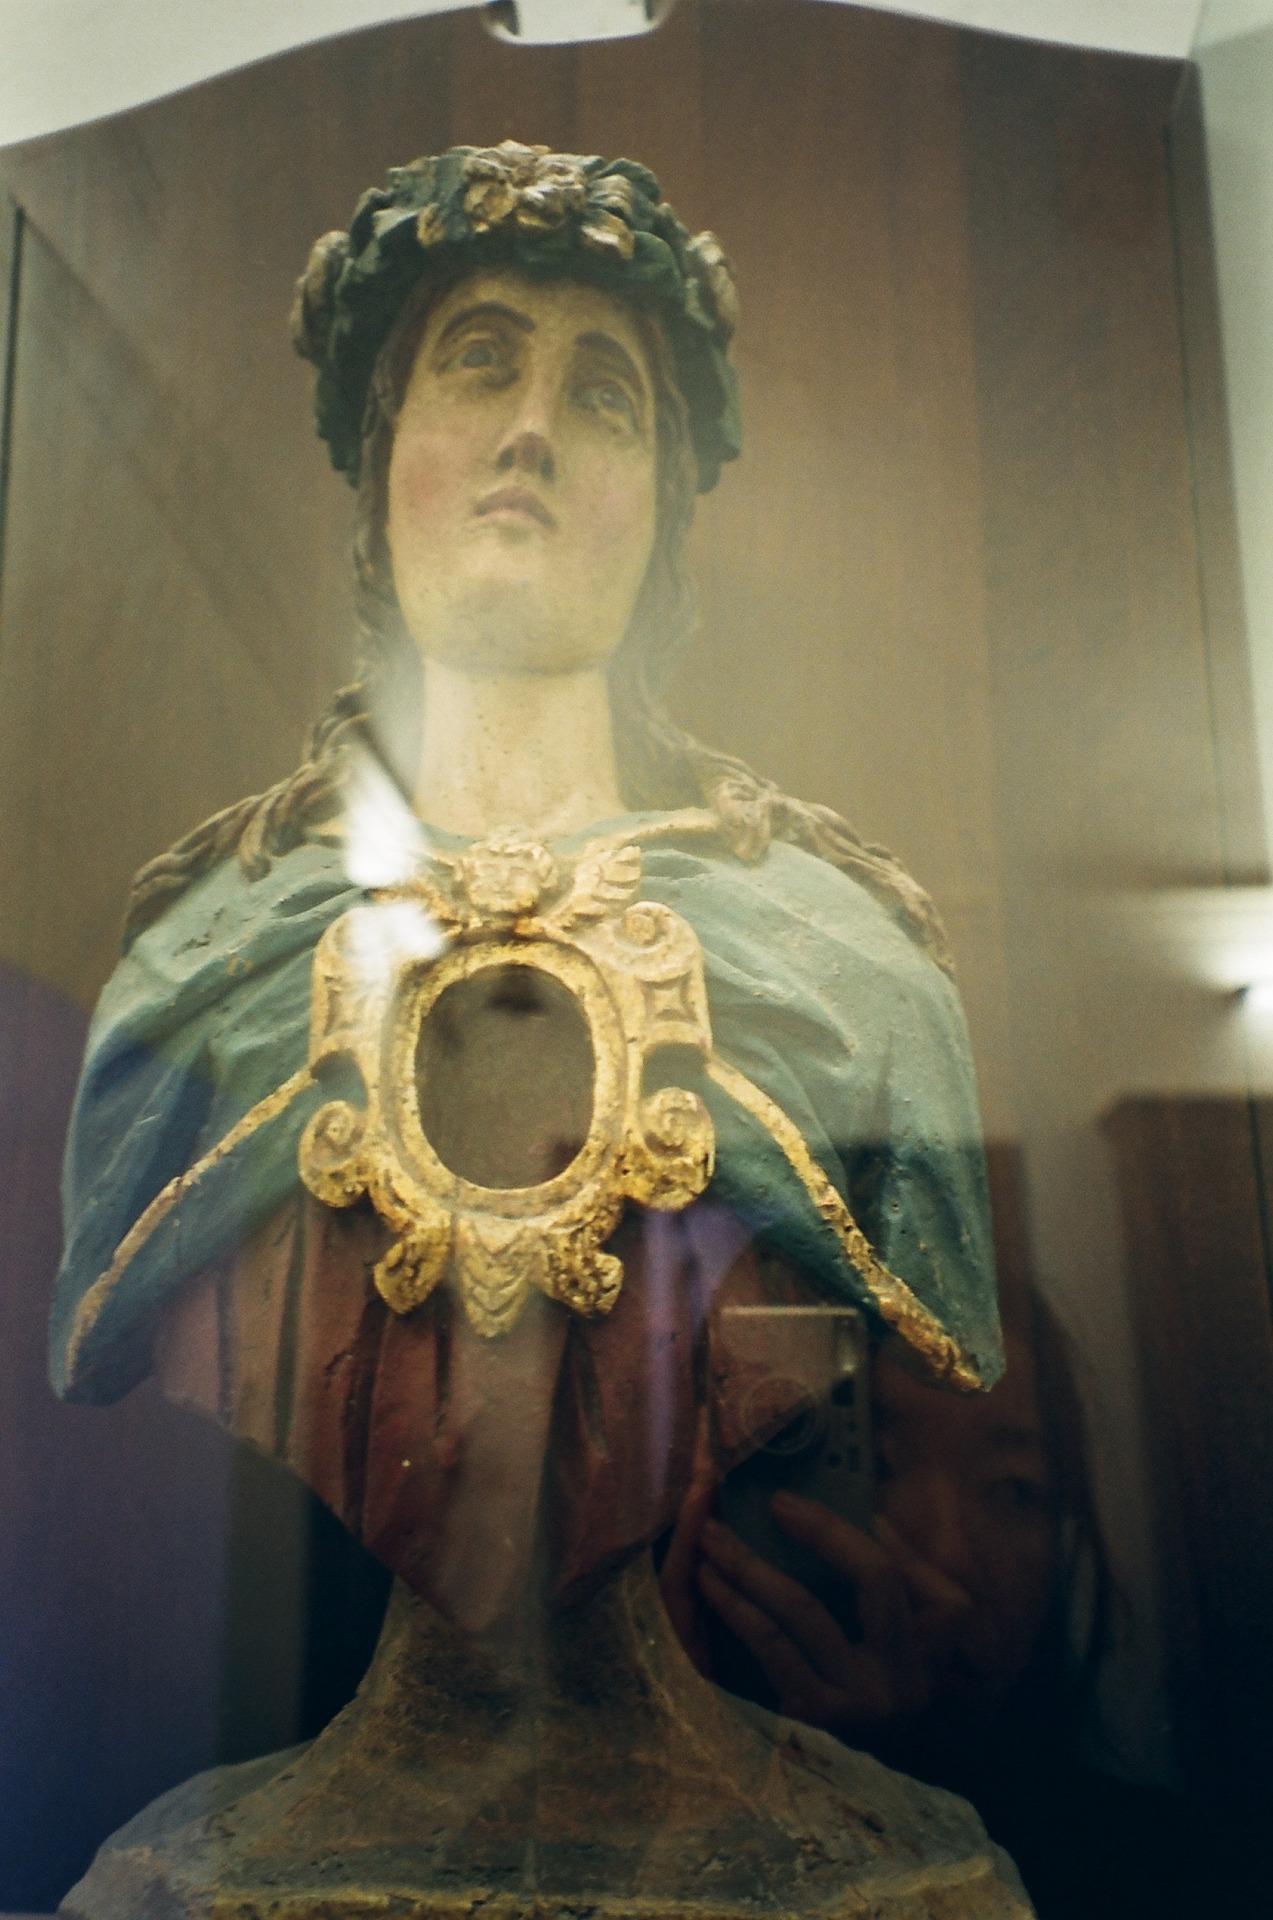 Reflecting upon a Saint